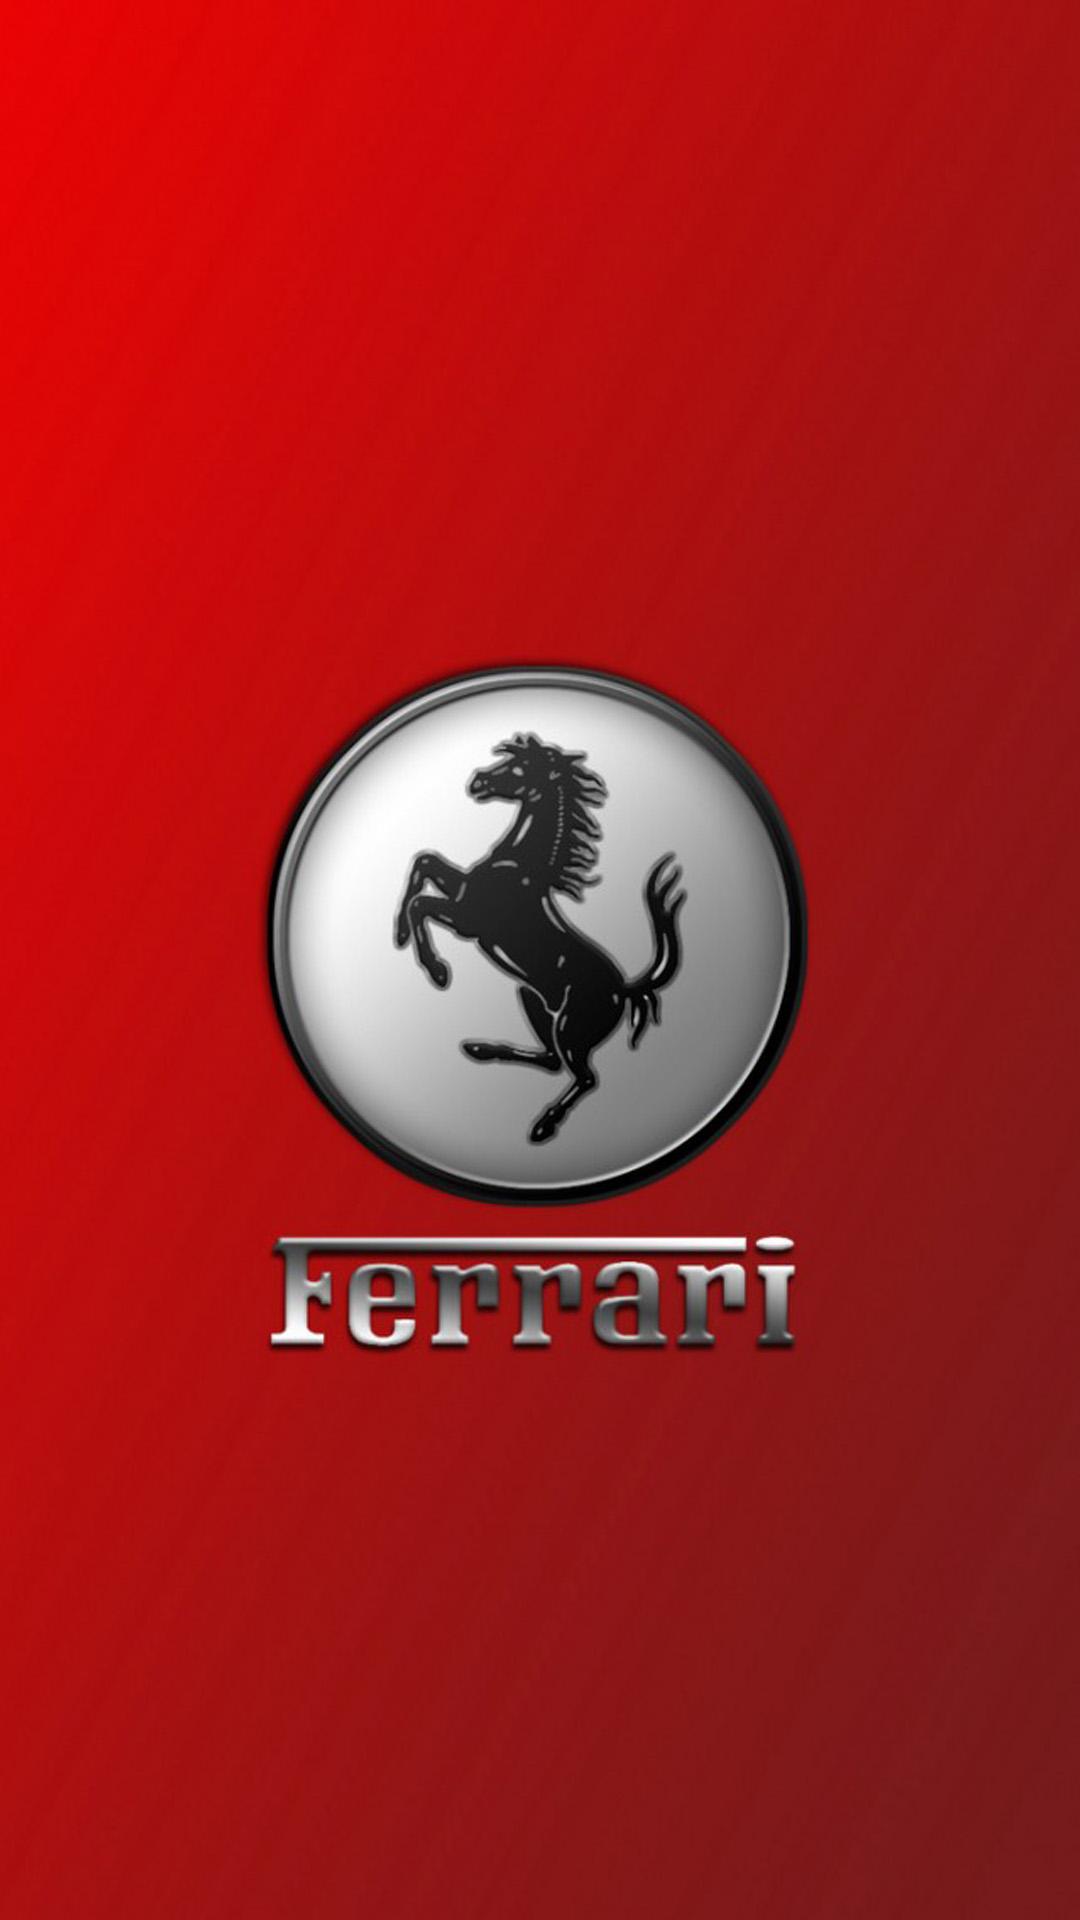 Whatsapp Car Wallpaper Download Ferrari Iphone Wallpapers Pixelstalk Net